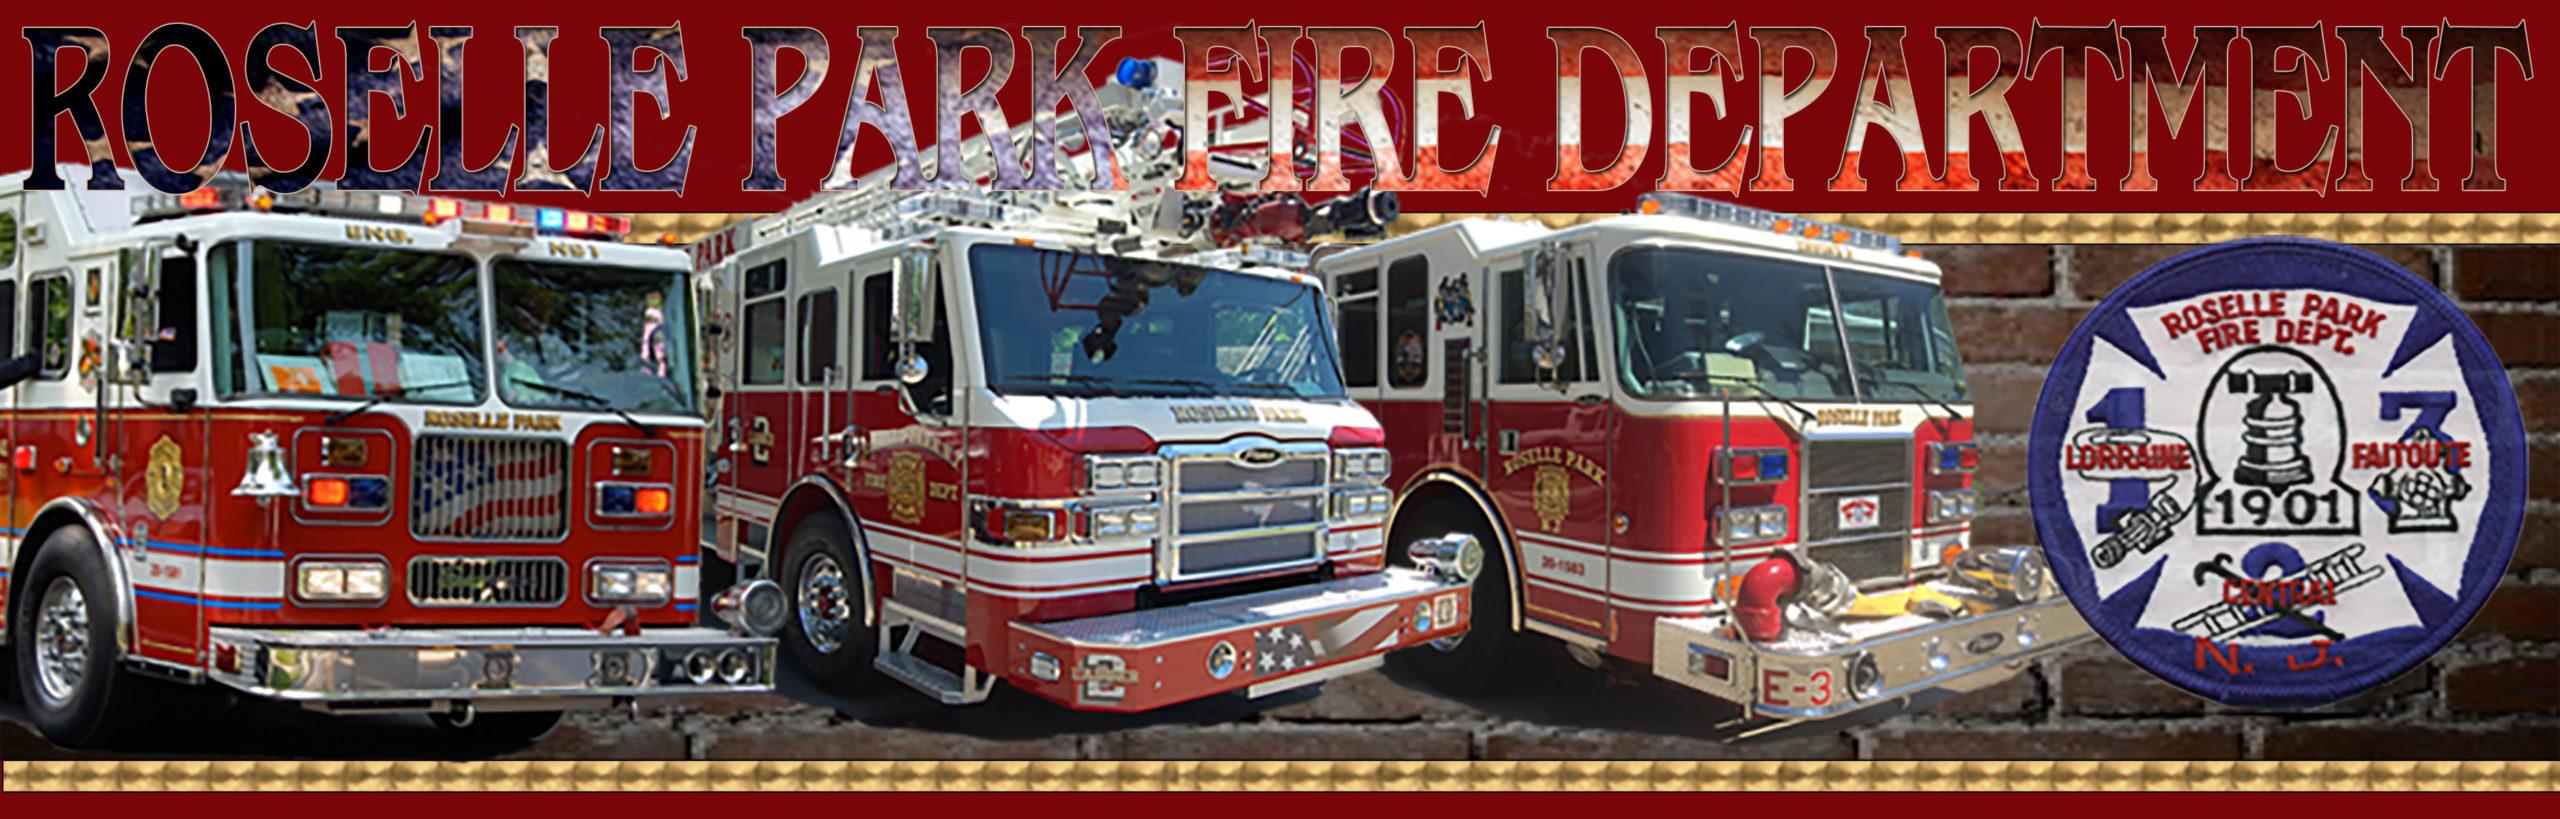 Roselle Park Fire Department